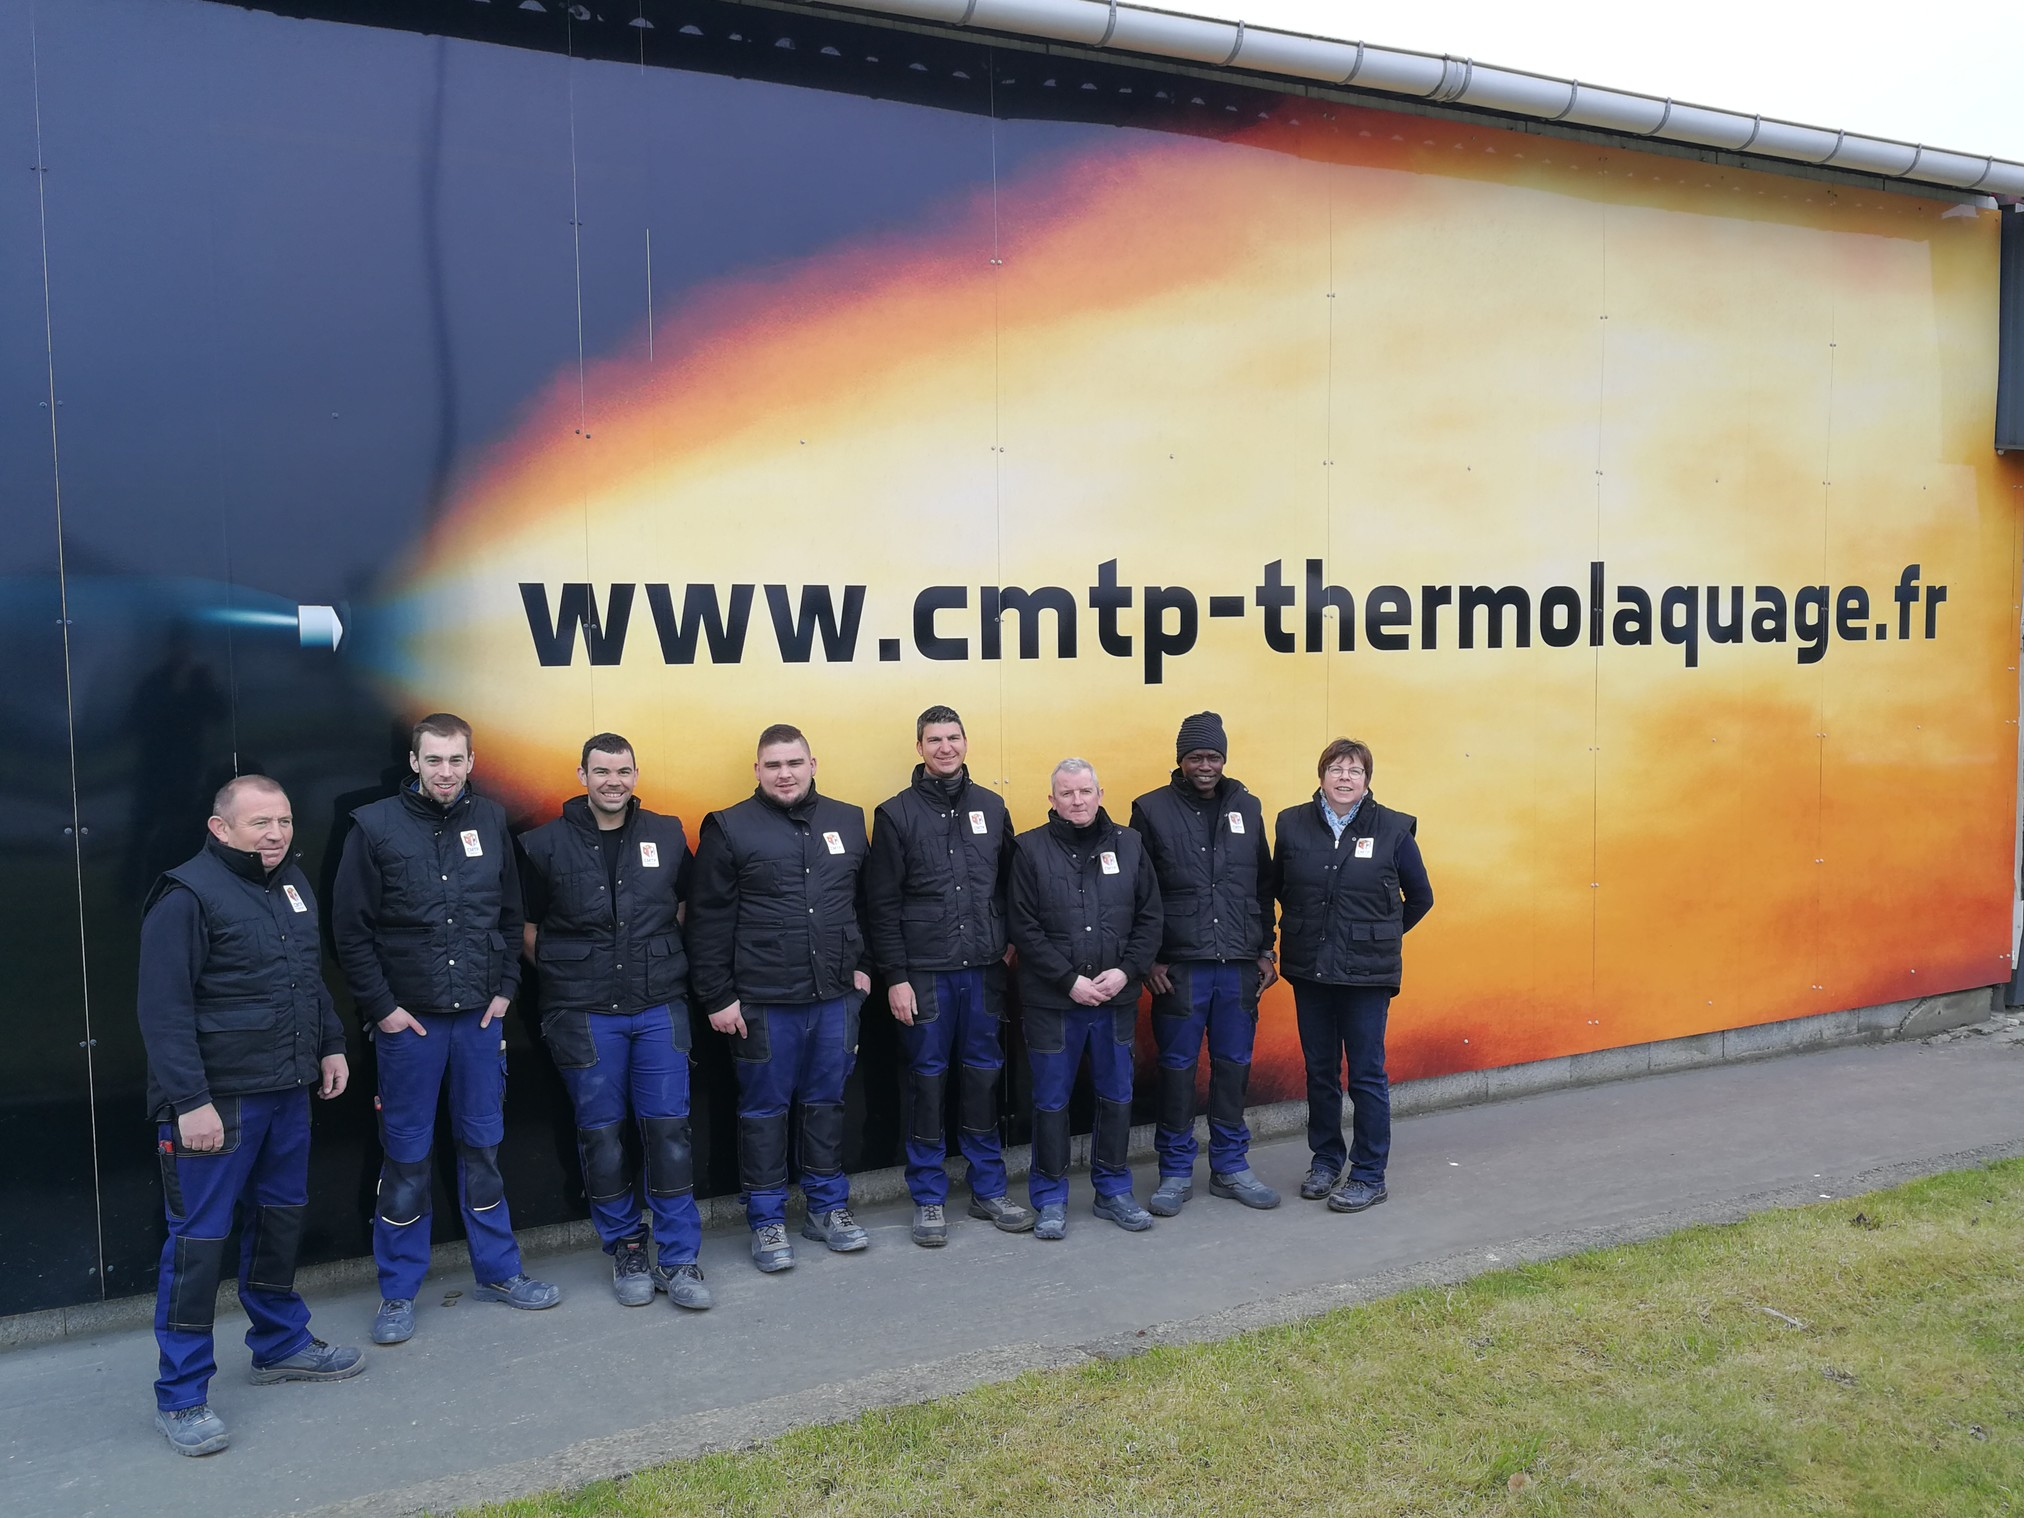 L'équipe CMTP